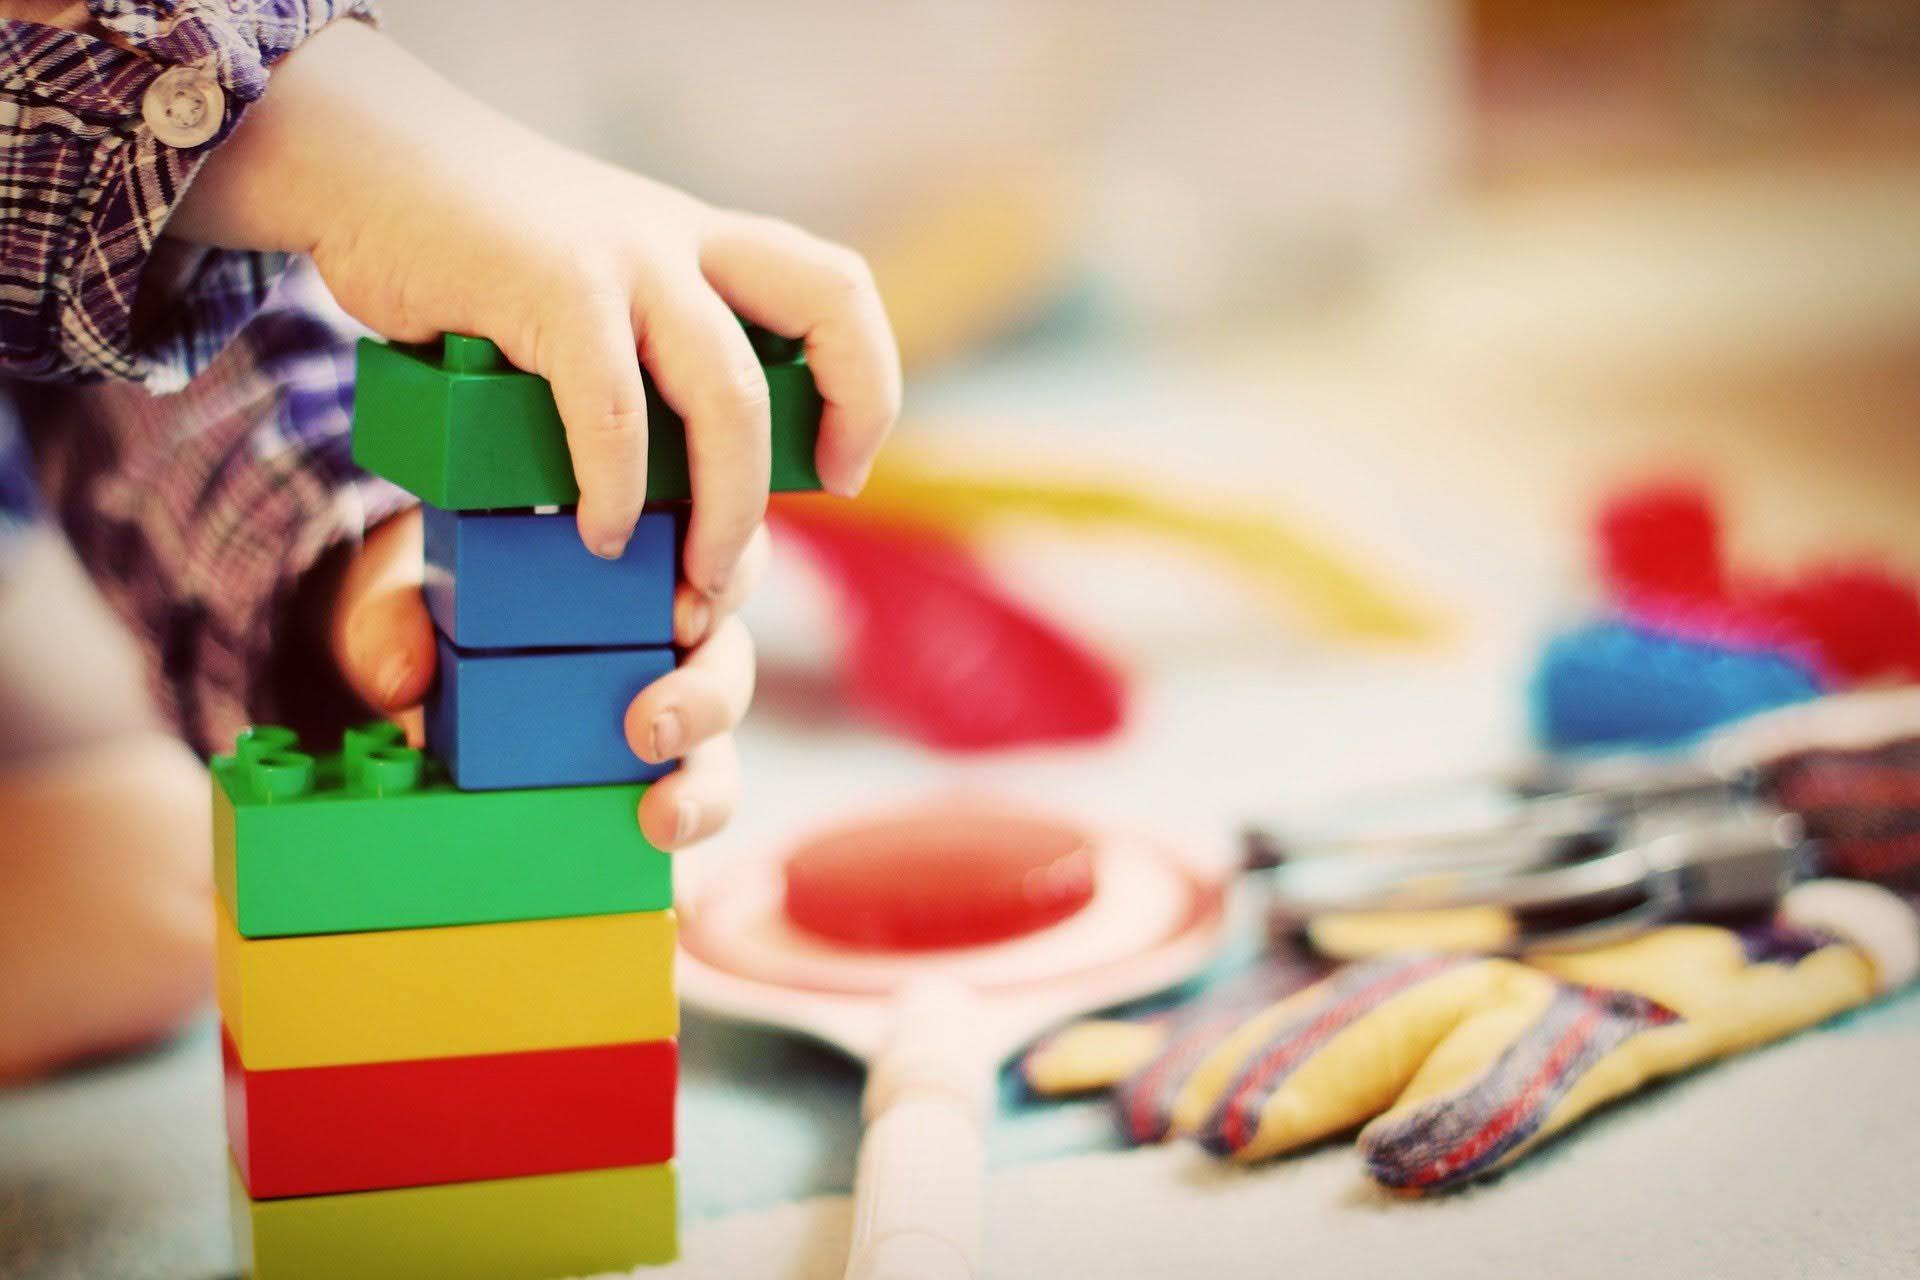 Symbolfoto / Kita / Kinderhände - Lego / freies Foto Pixabay